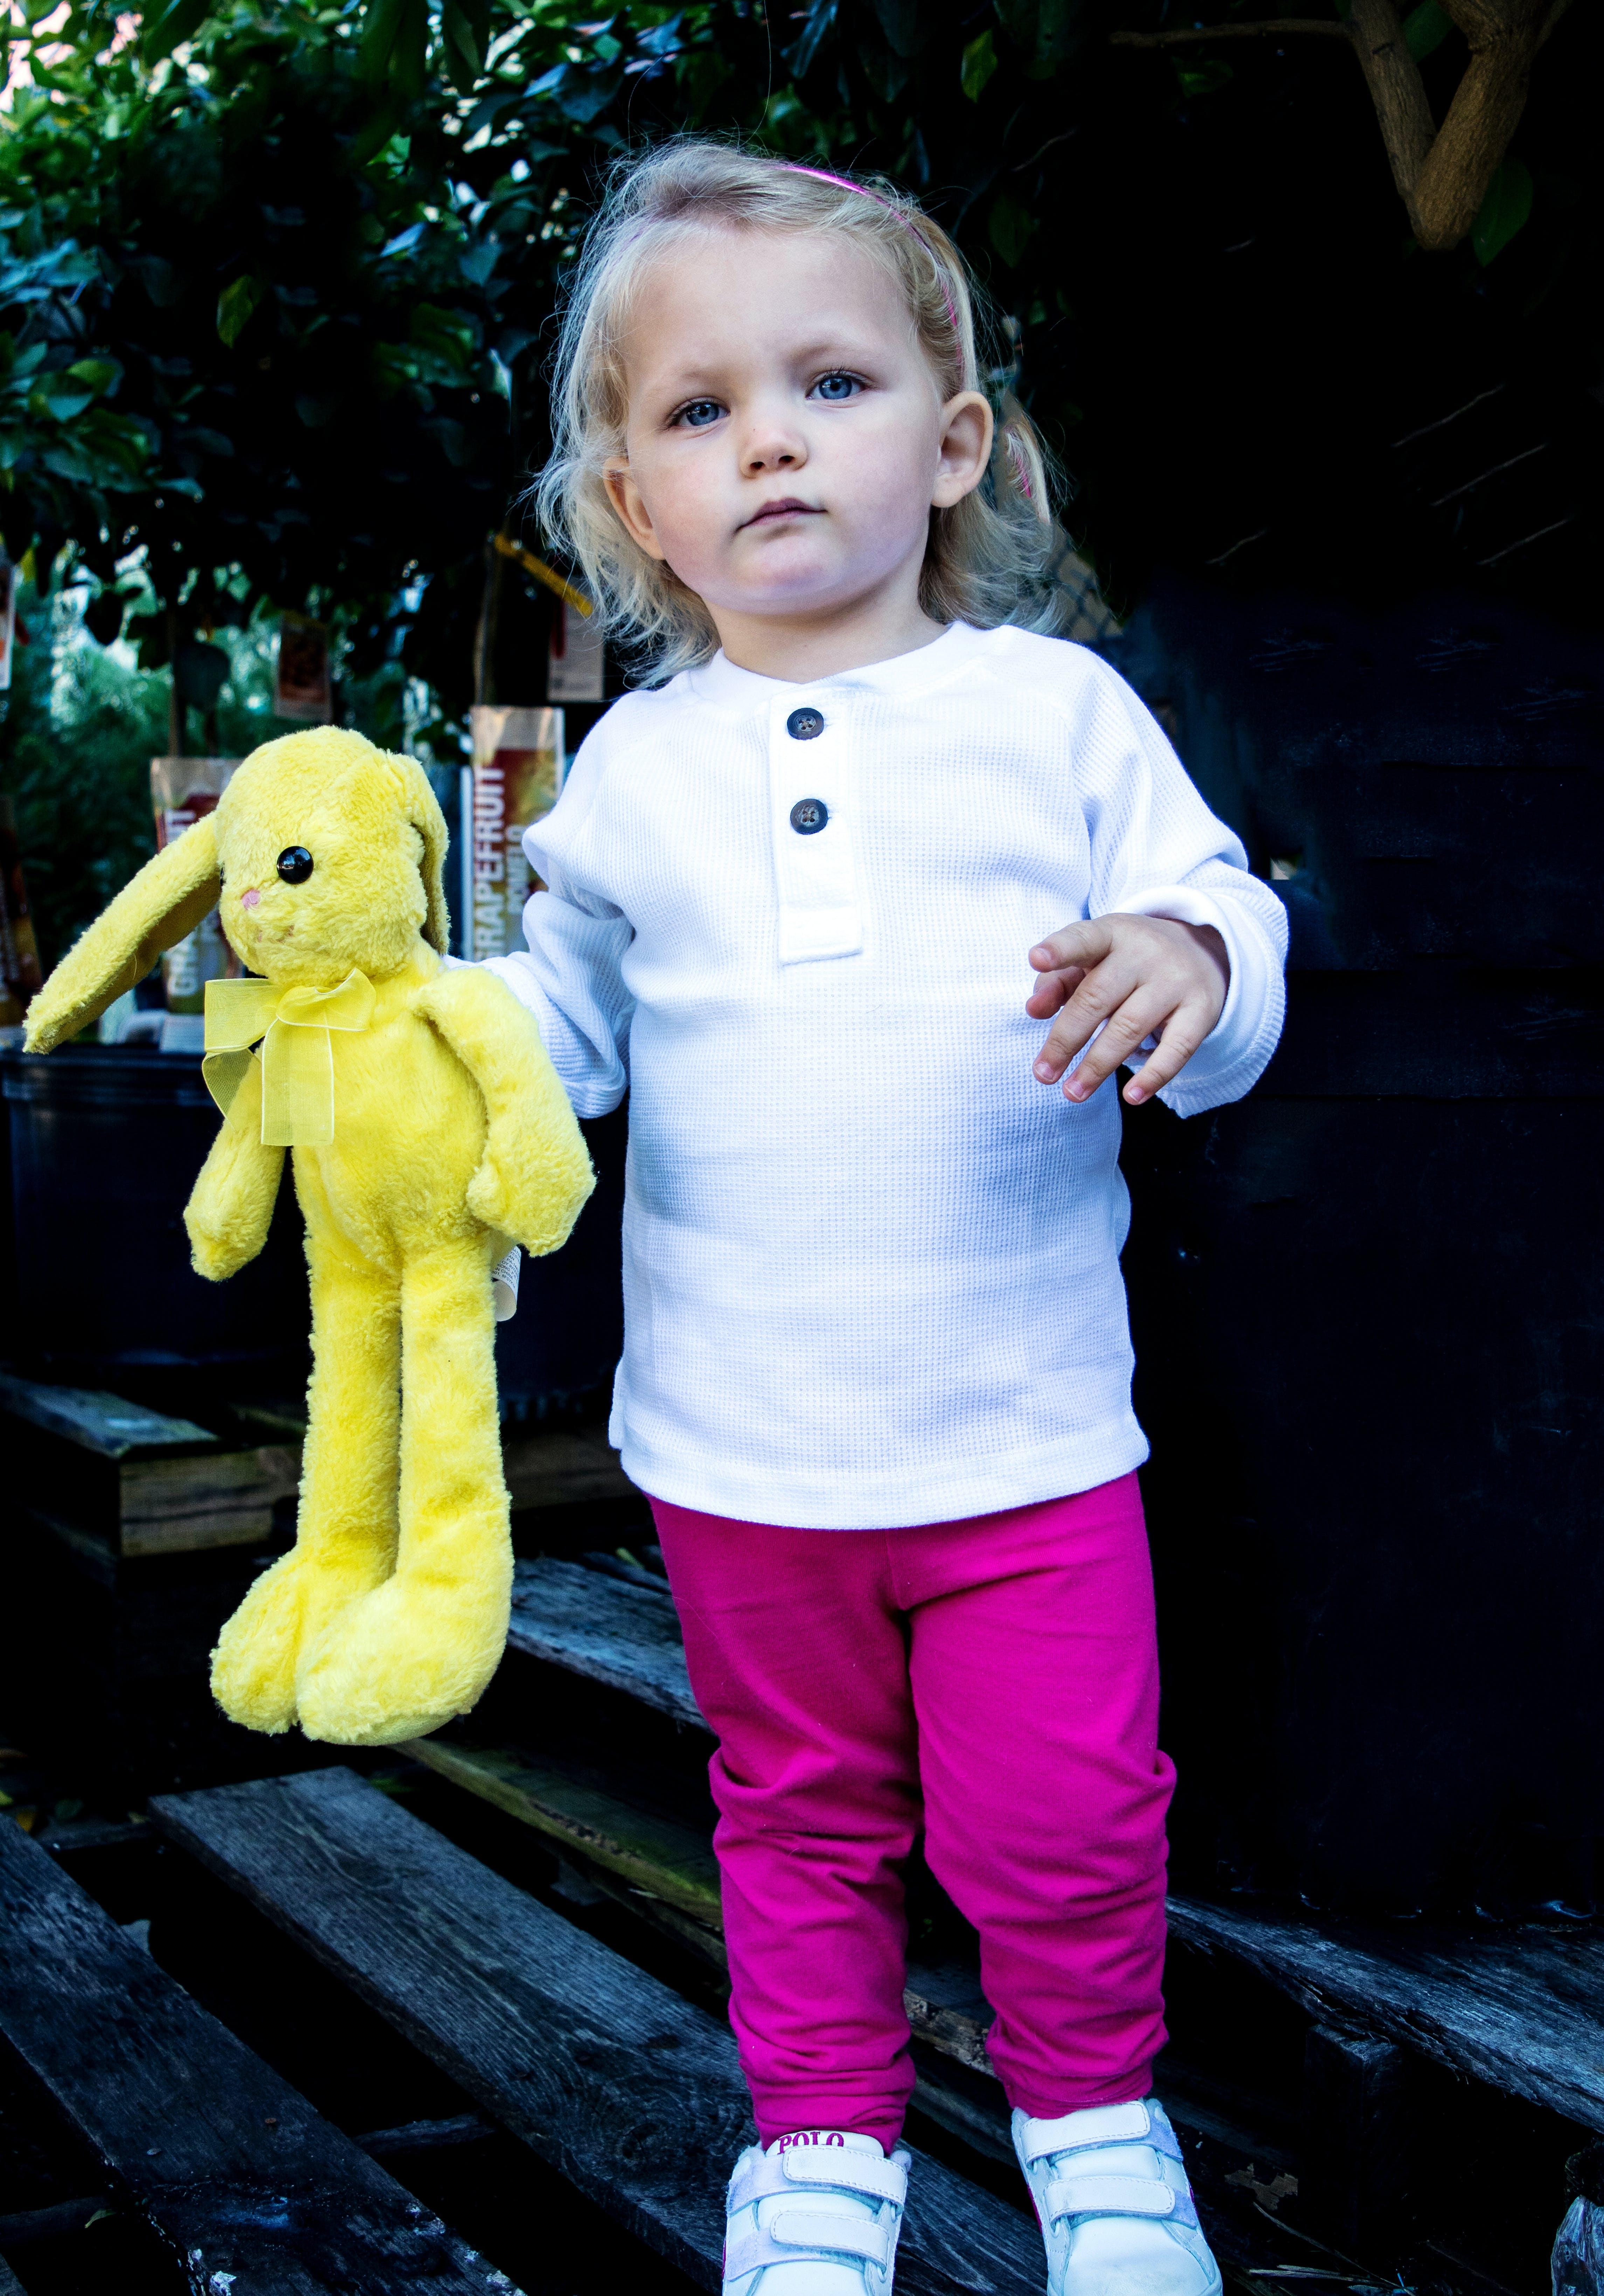 Free stock photo of baby girl